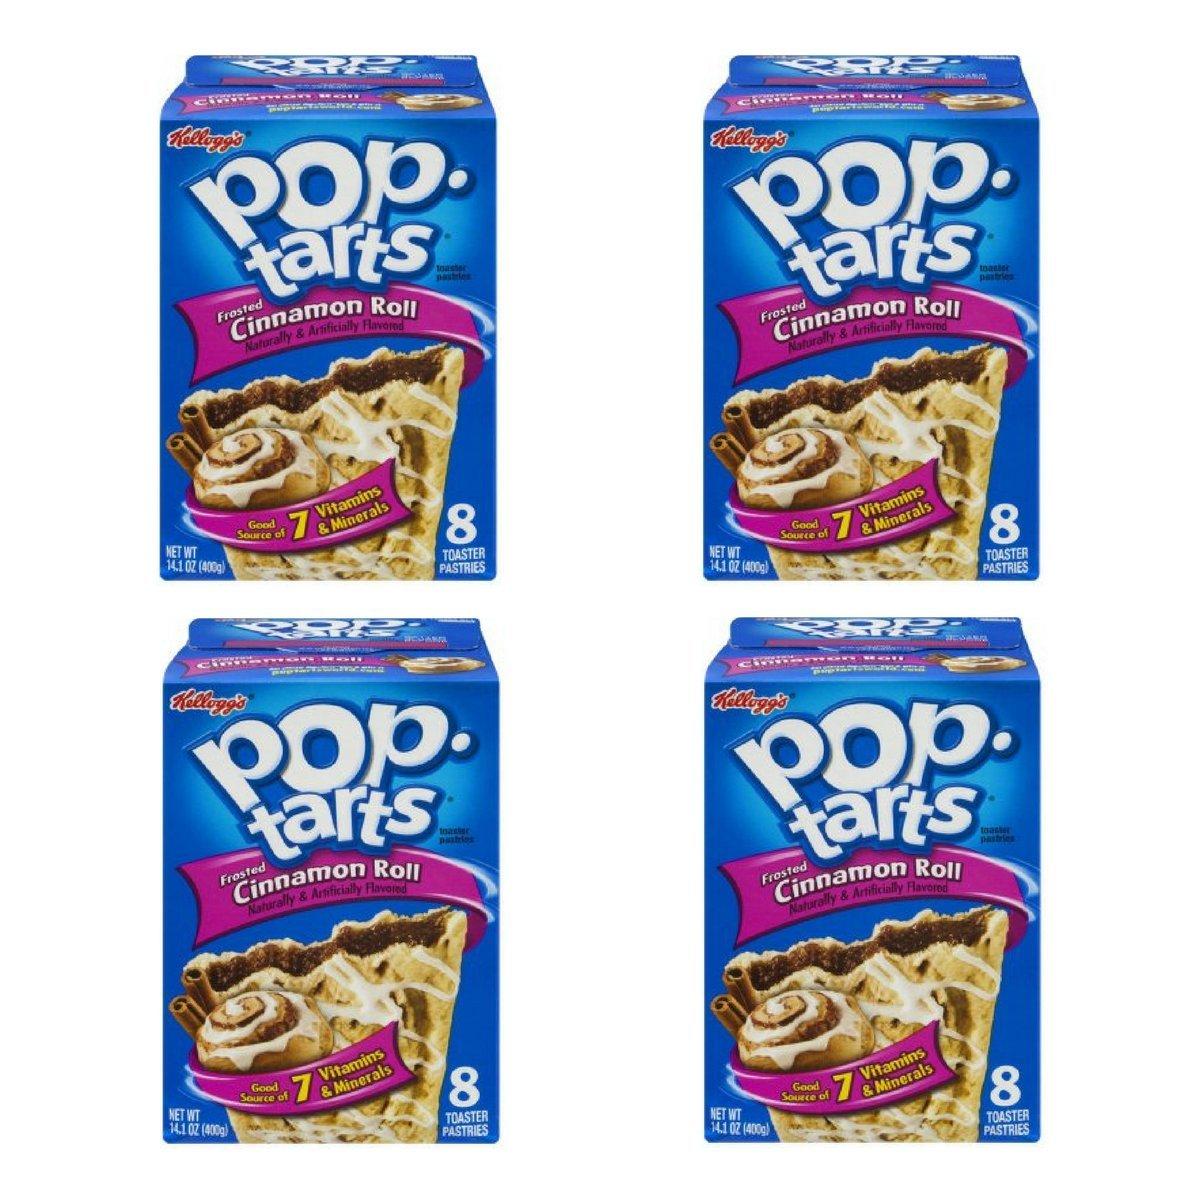 Kelloggs Pop-Tarts Cinnamon Roll, 8 ct, 14.1 oz (Pack of 4) by Kellogg's (Image #1)